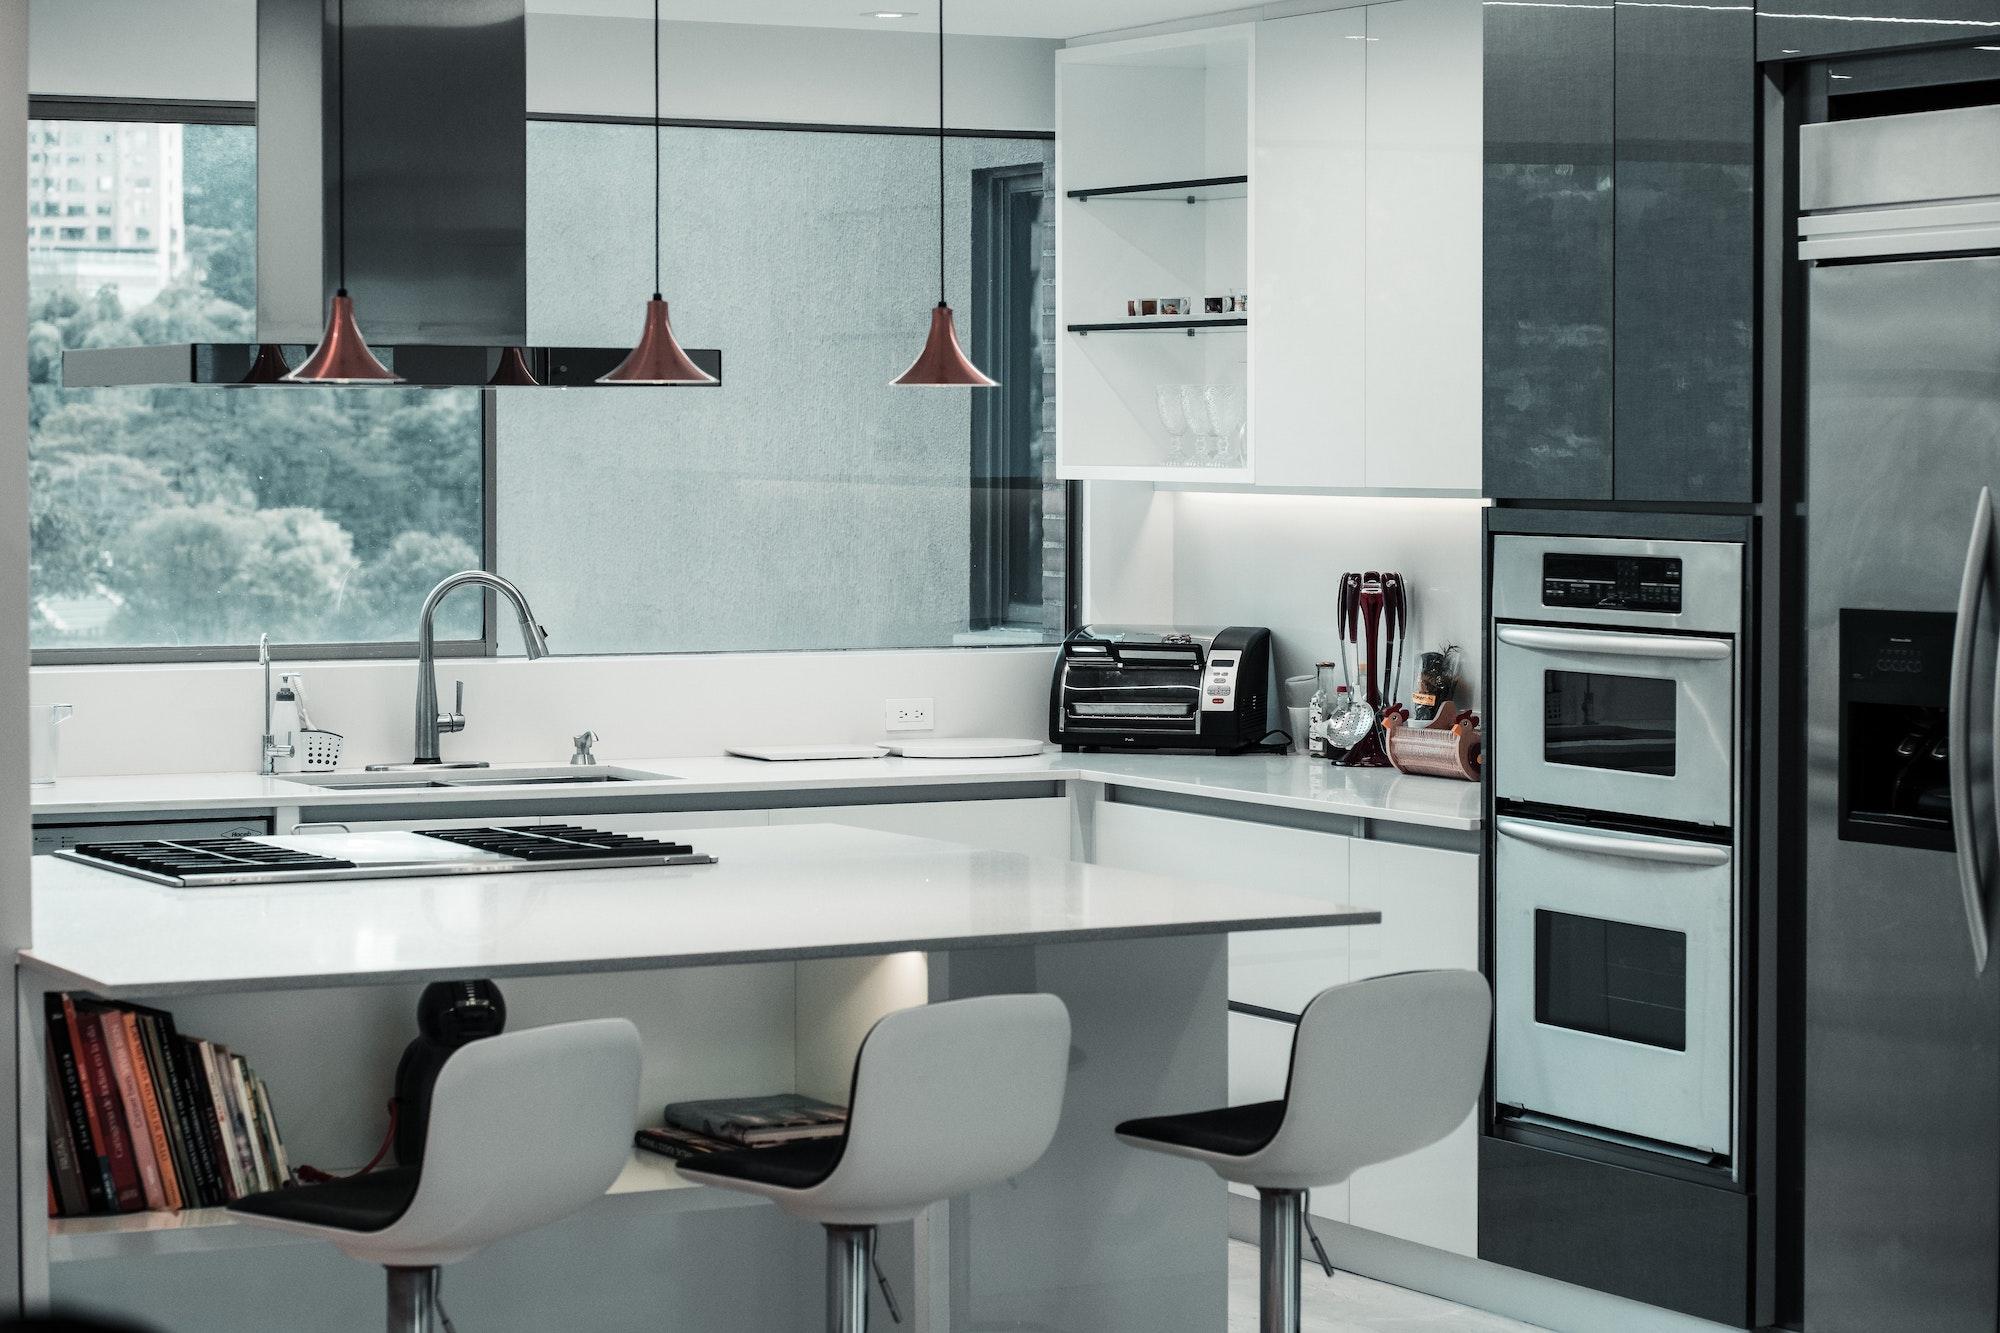 Changing your kitchen cabinets | Home Interiors | Elle Blonde Luxury Lifestyle Destination Blog